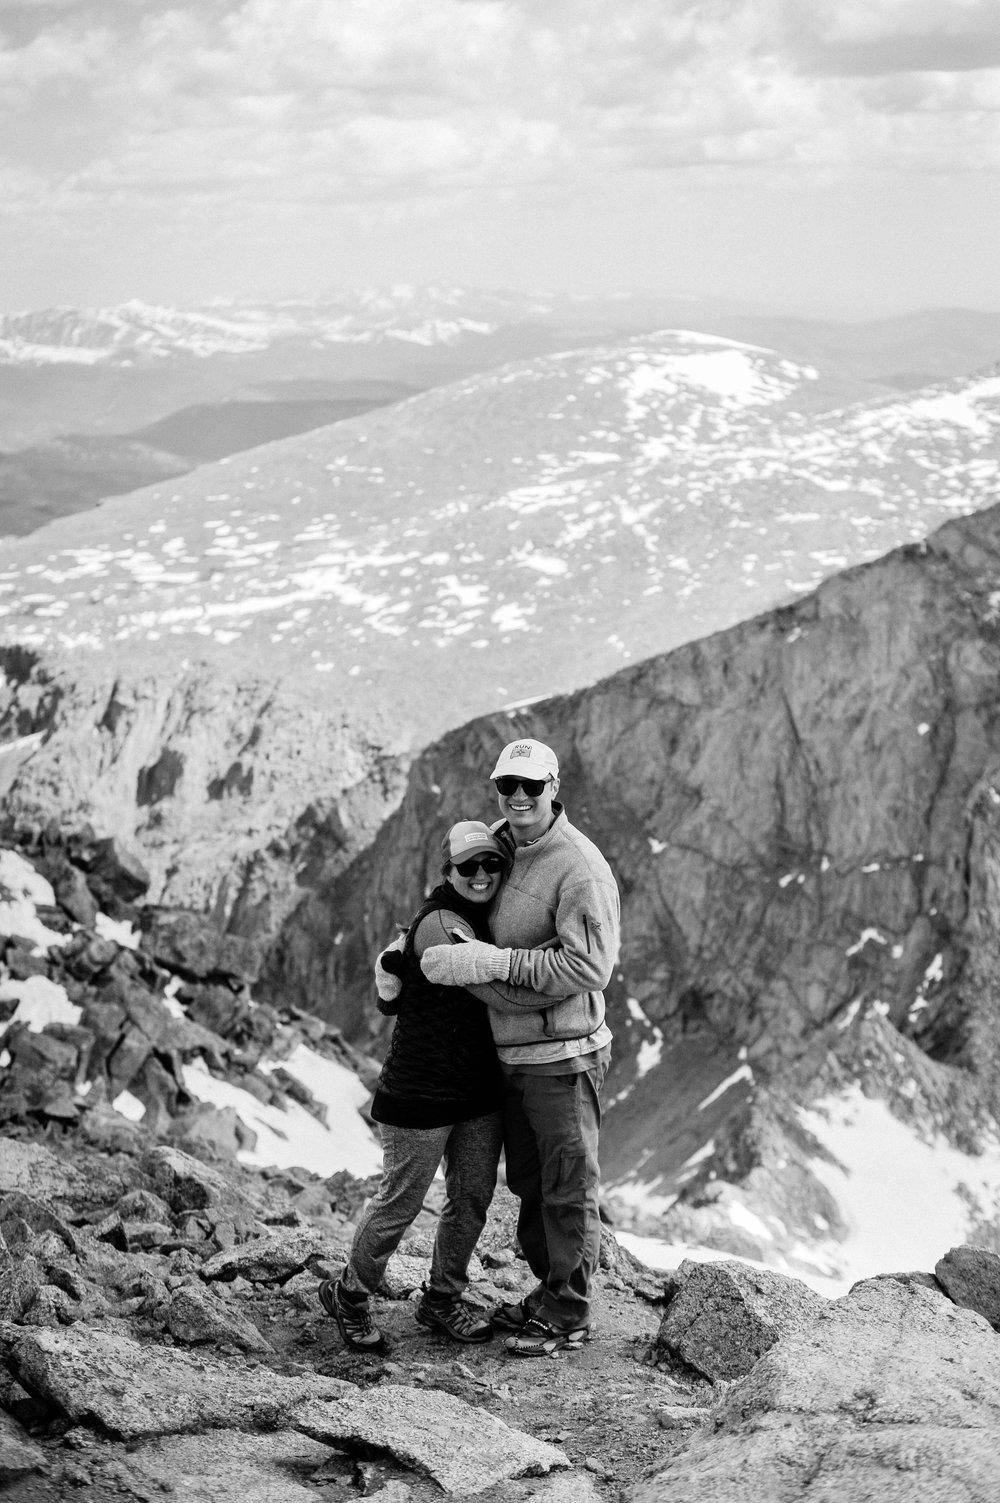 Adventure Photography of Ashleigh and Matt on Mt. Bierstadt